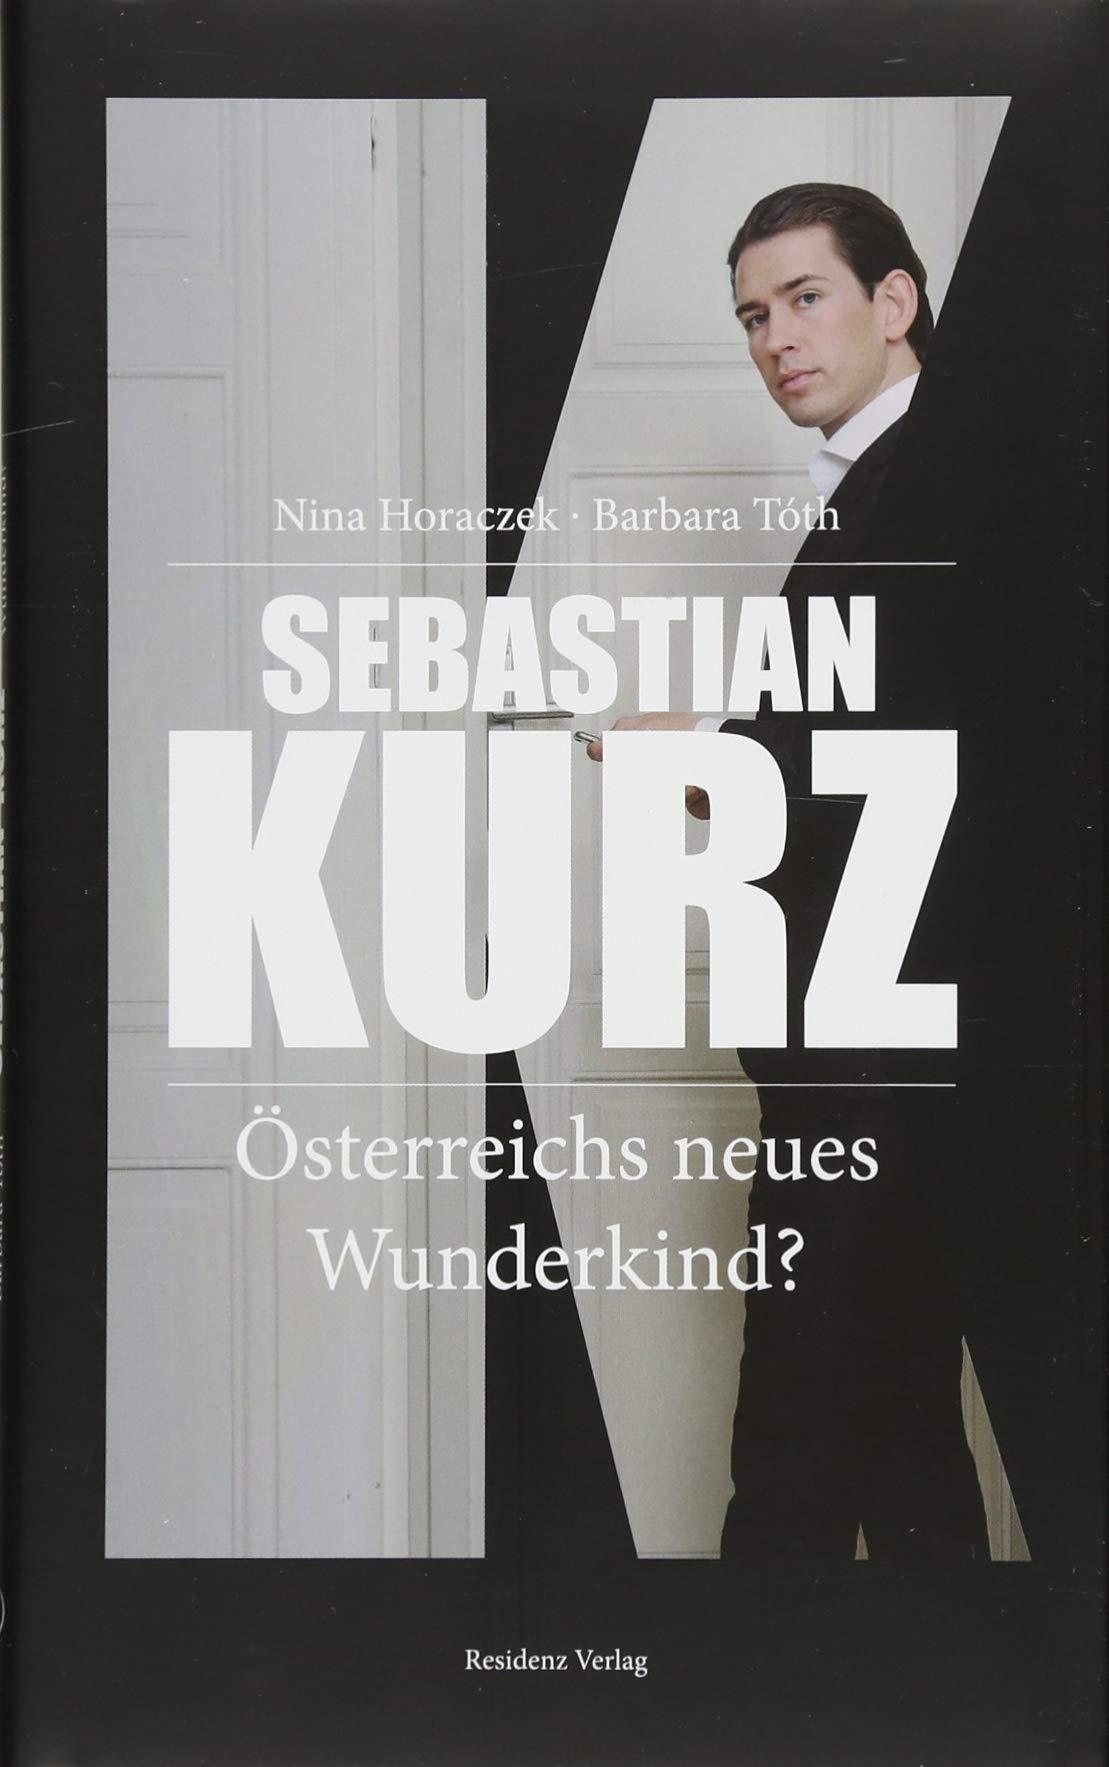 Zweite Biografie Uber Bundeskanzler Sebastian